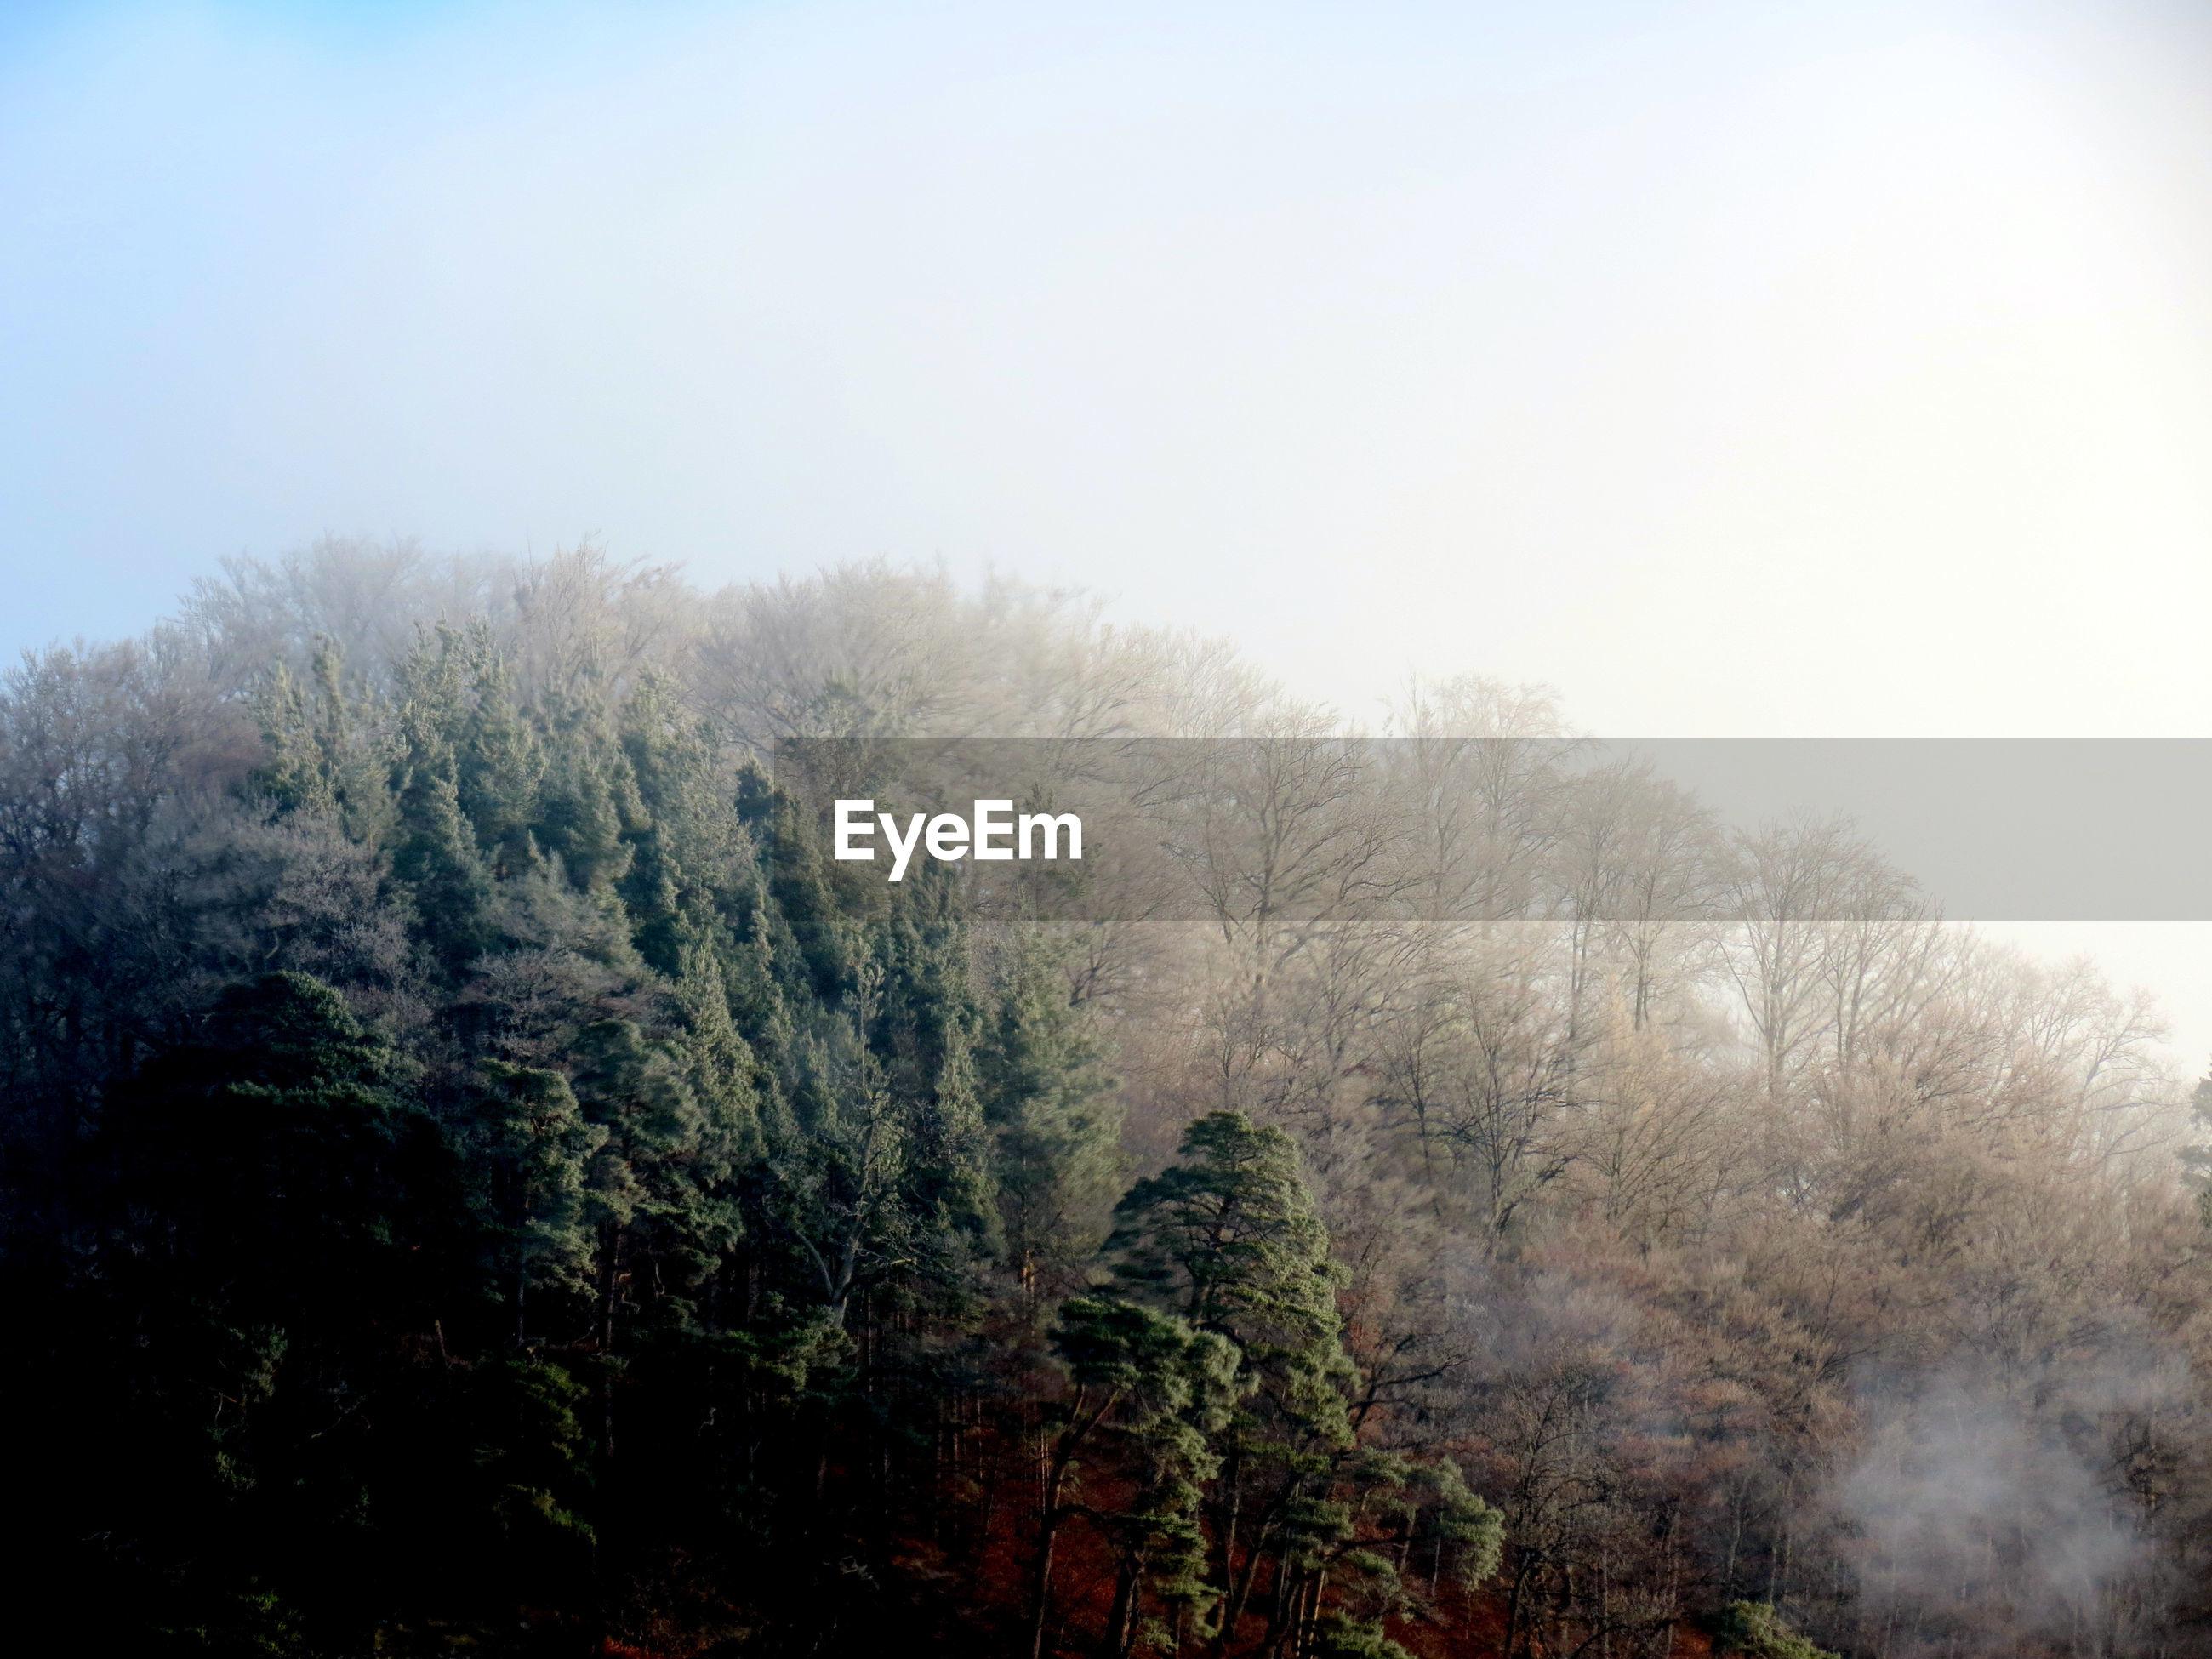 TREES AGAINST CLEAR SKY